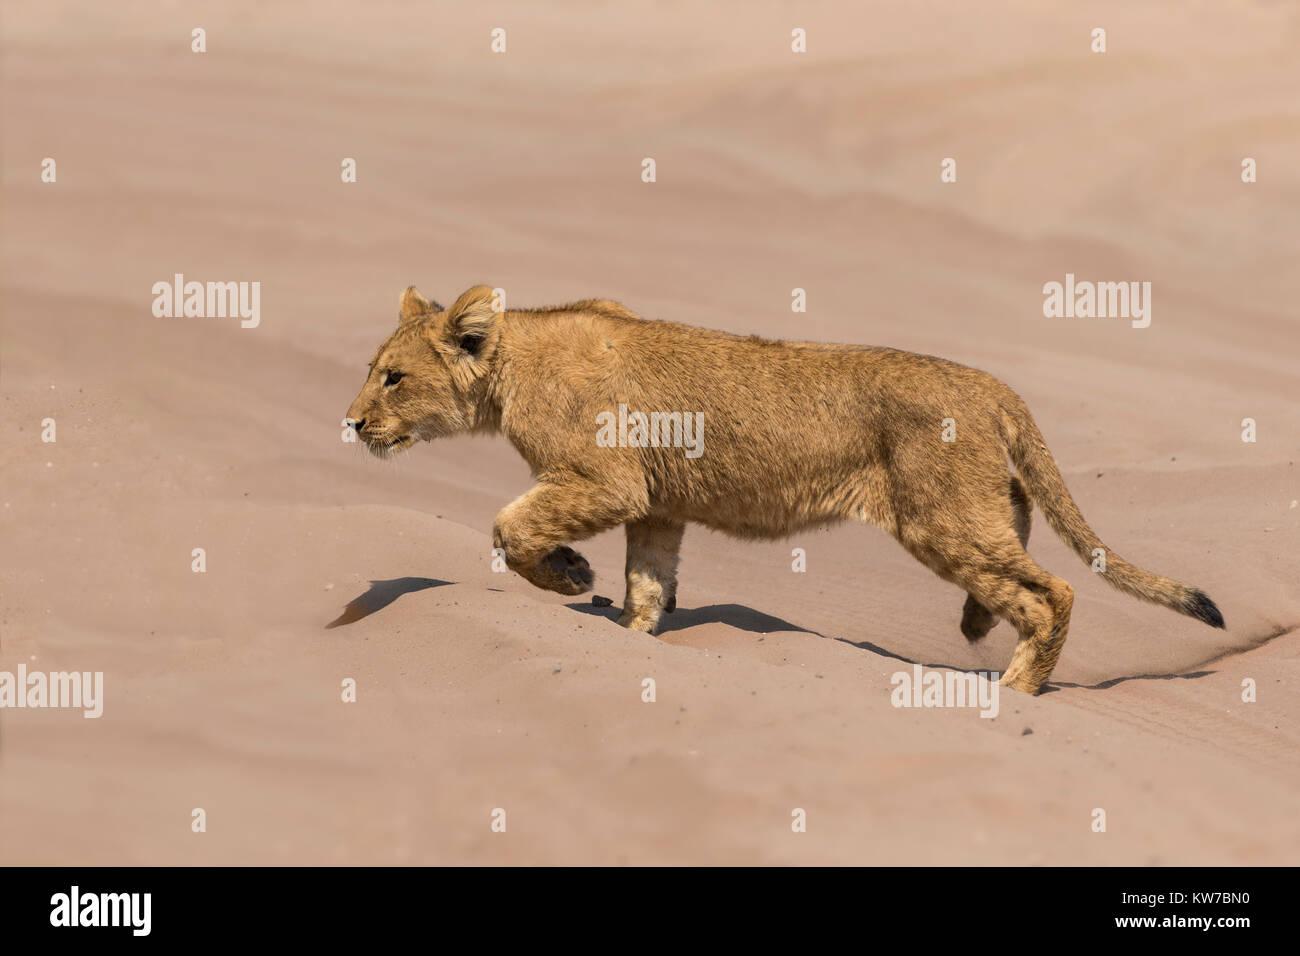 Lion (Panthera leo) cub, Chobe National Park, Botswana, September 2017 - Stock Image